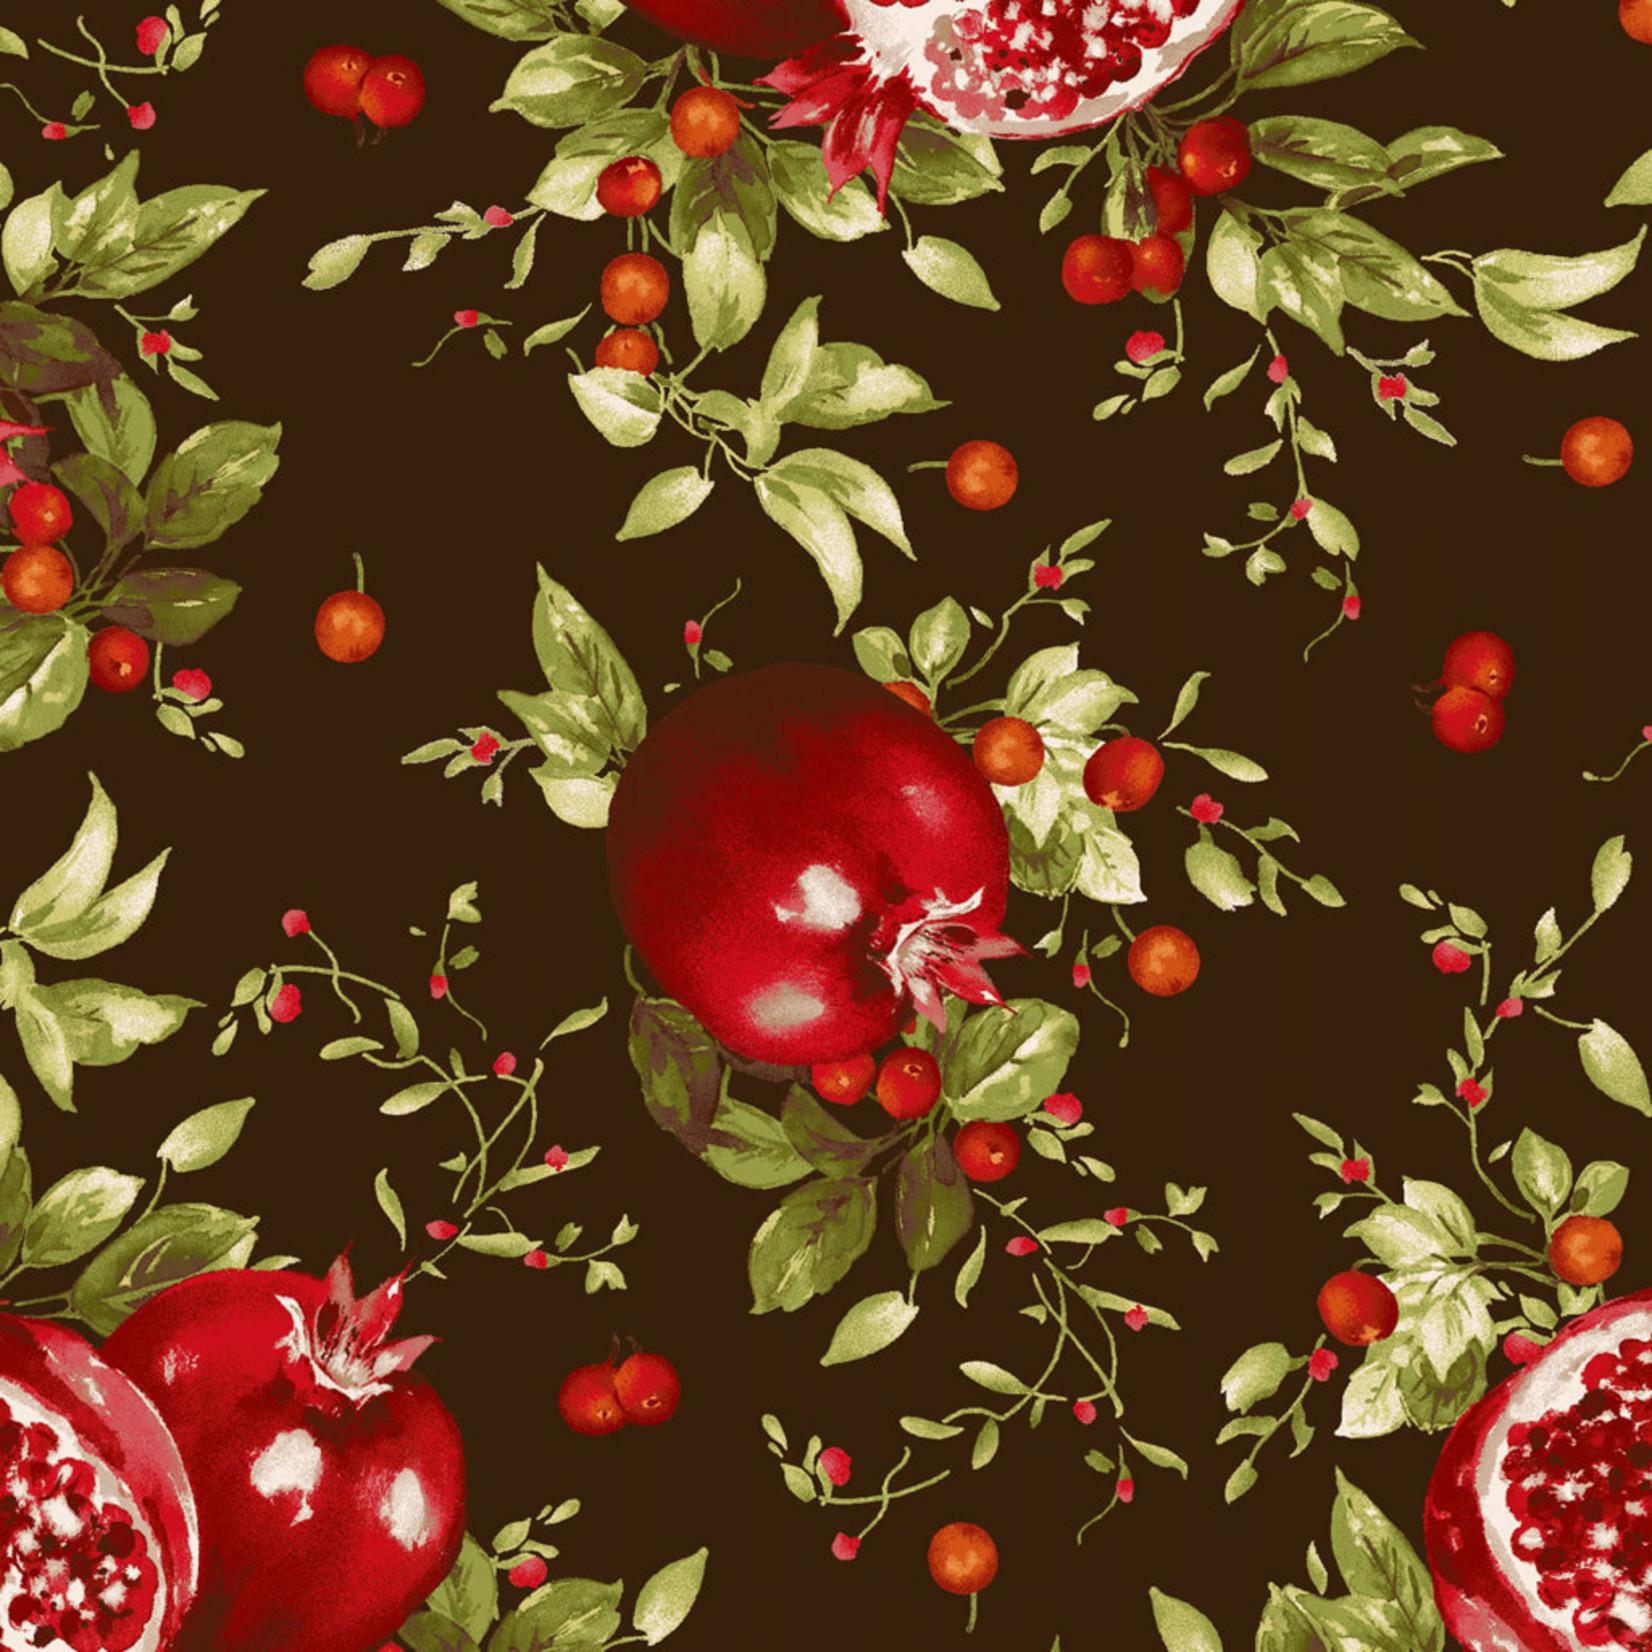 Maywood Studio Bountiful - Pomegranate Small - Brown